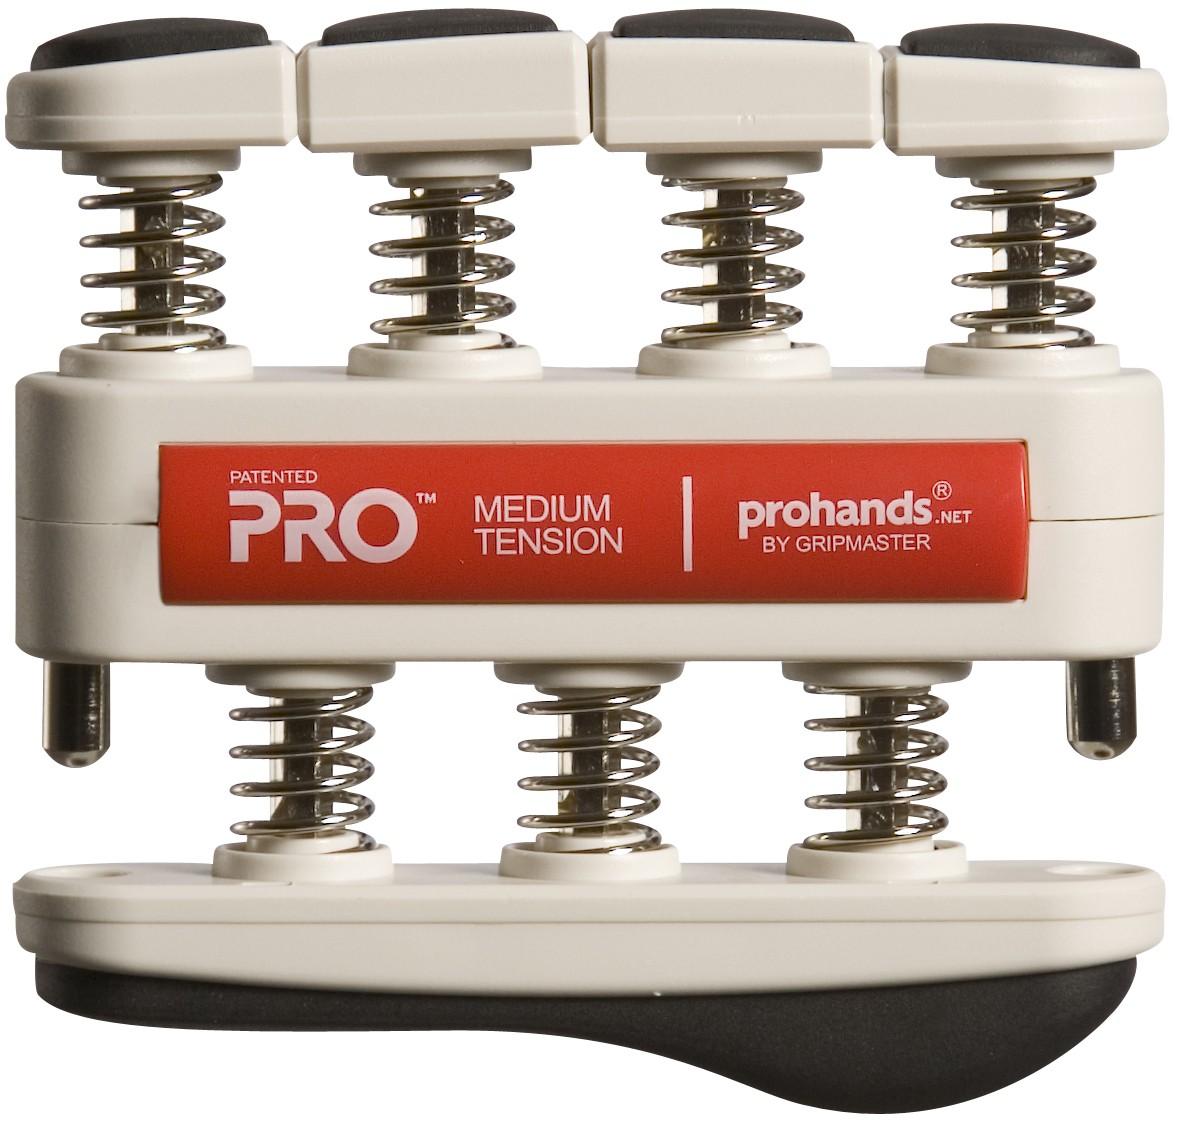 Prohands Pro